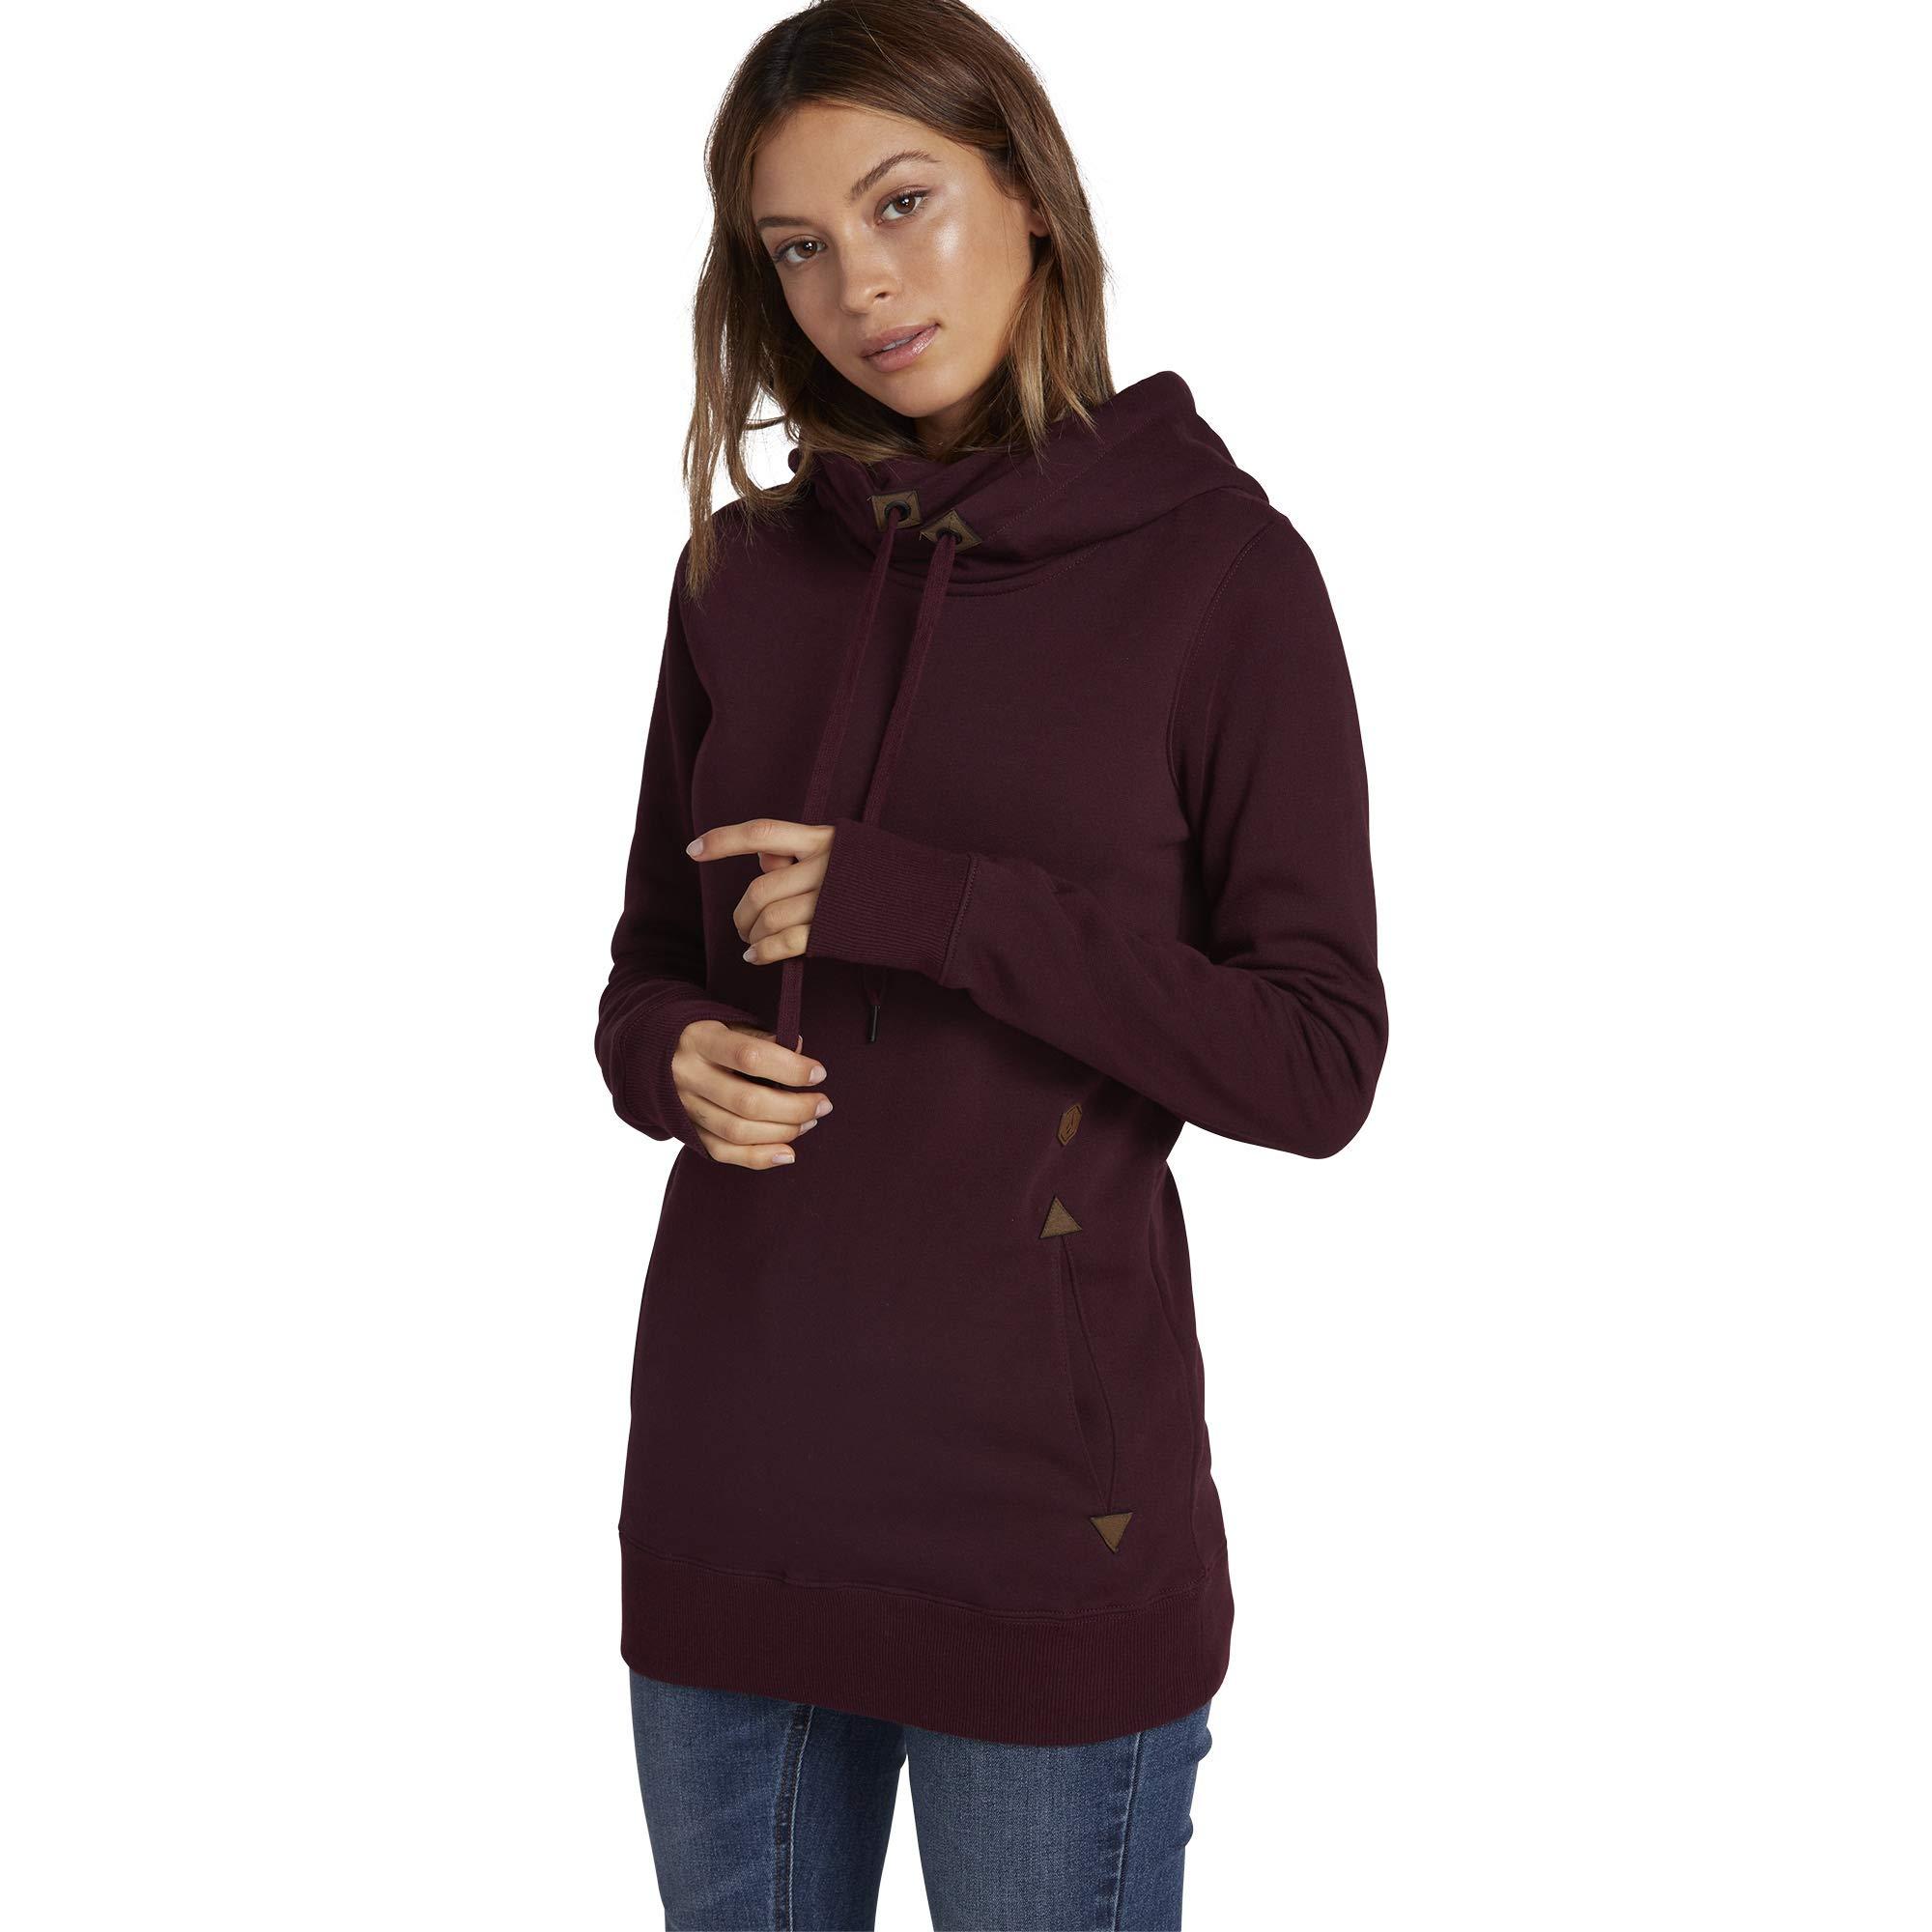 Volcom Women's Tower Pullover Heather Fleece Hooded Baselayer Sweatshirt, Merlot, Large by Volcom